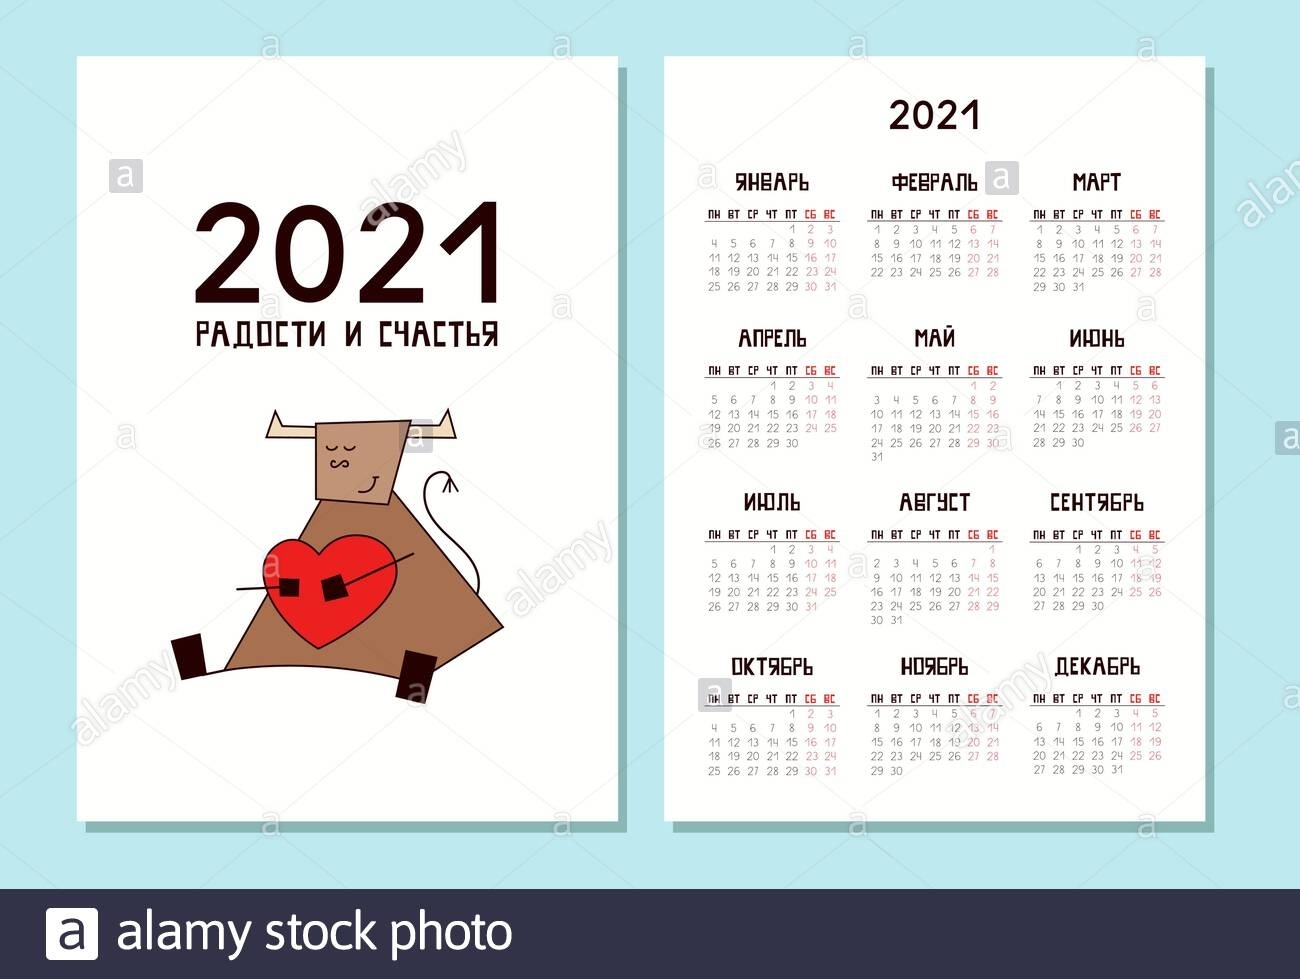 Calendar Or Planner A4 Format For 2021 With A Cute Kawaii Календарь Декабрь Схема2021